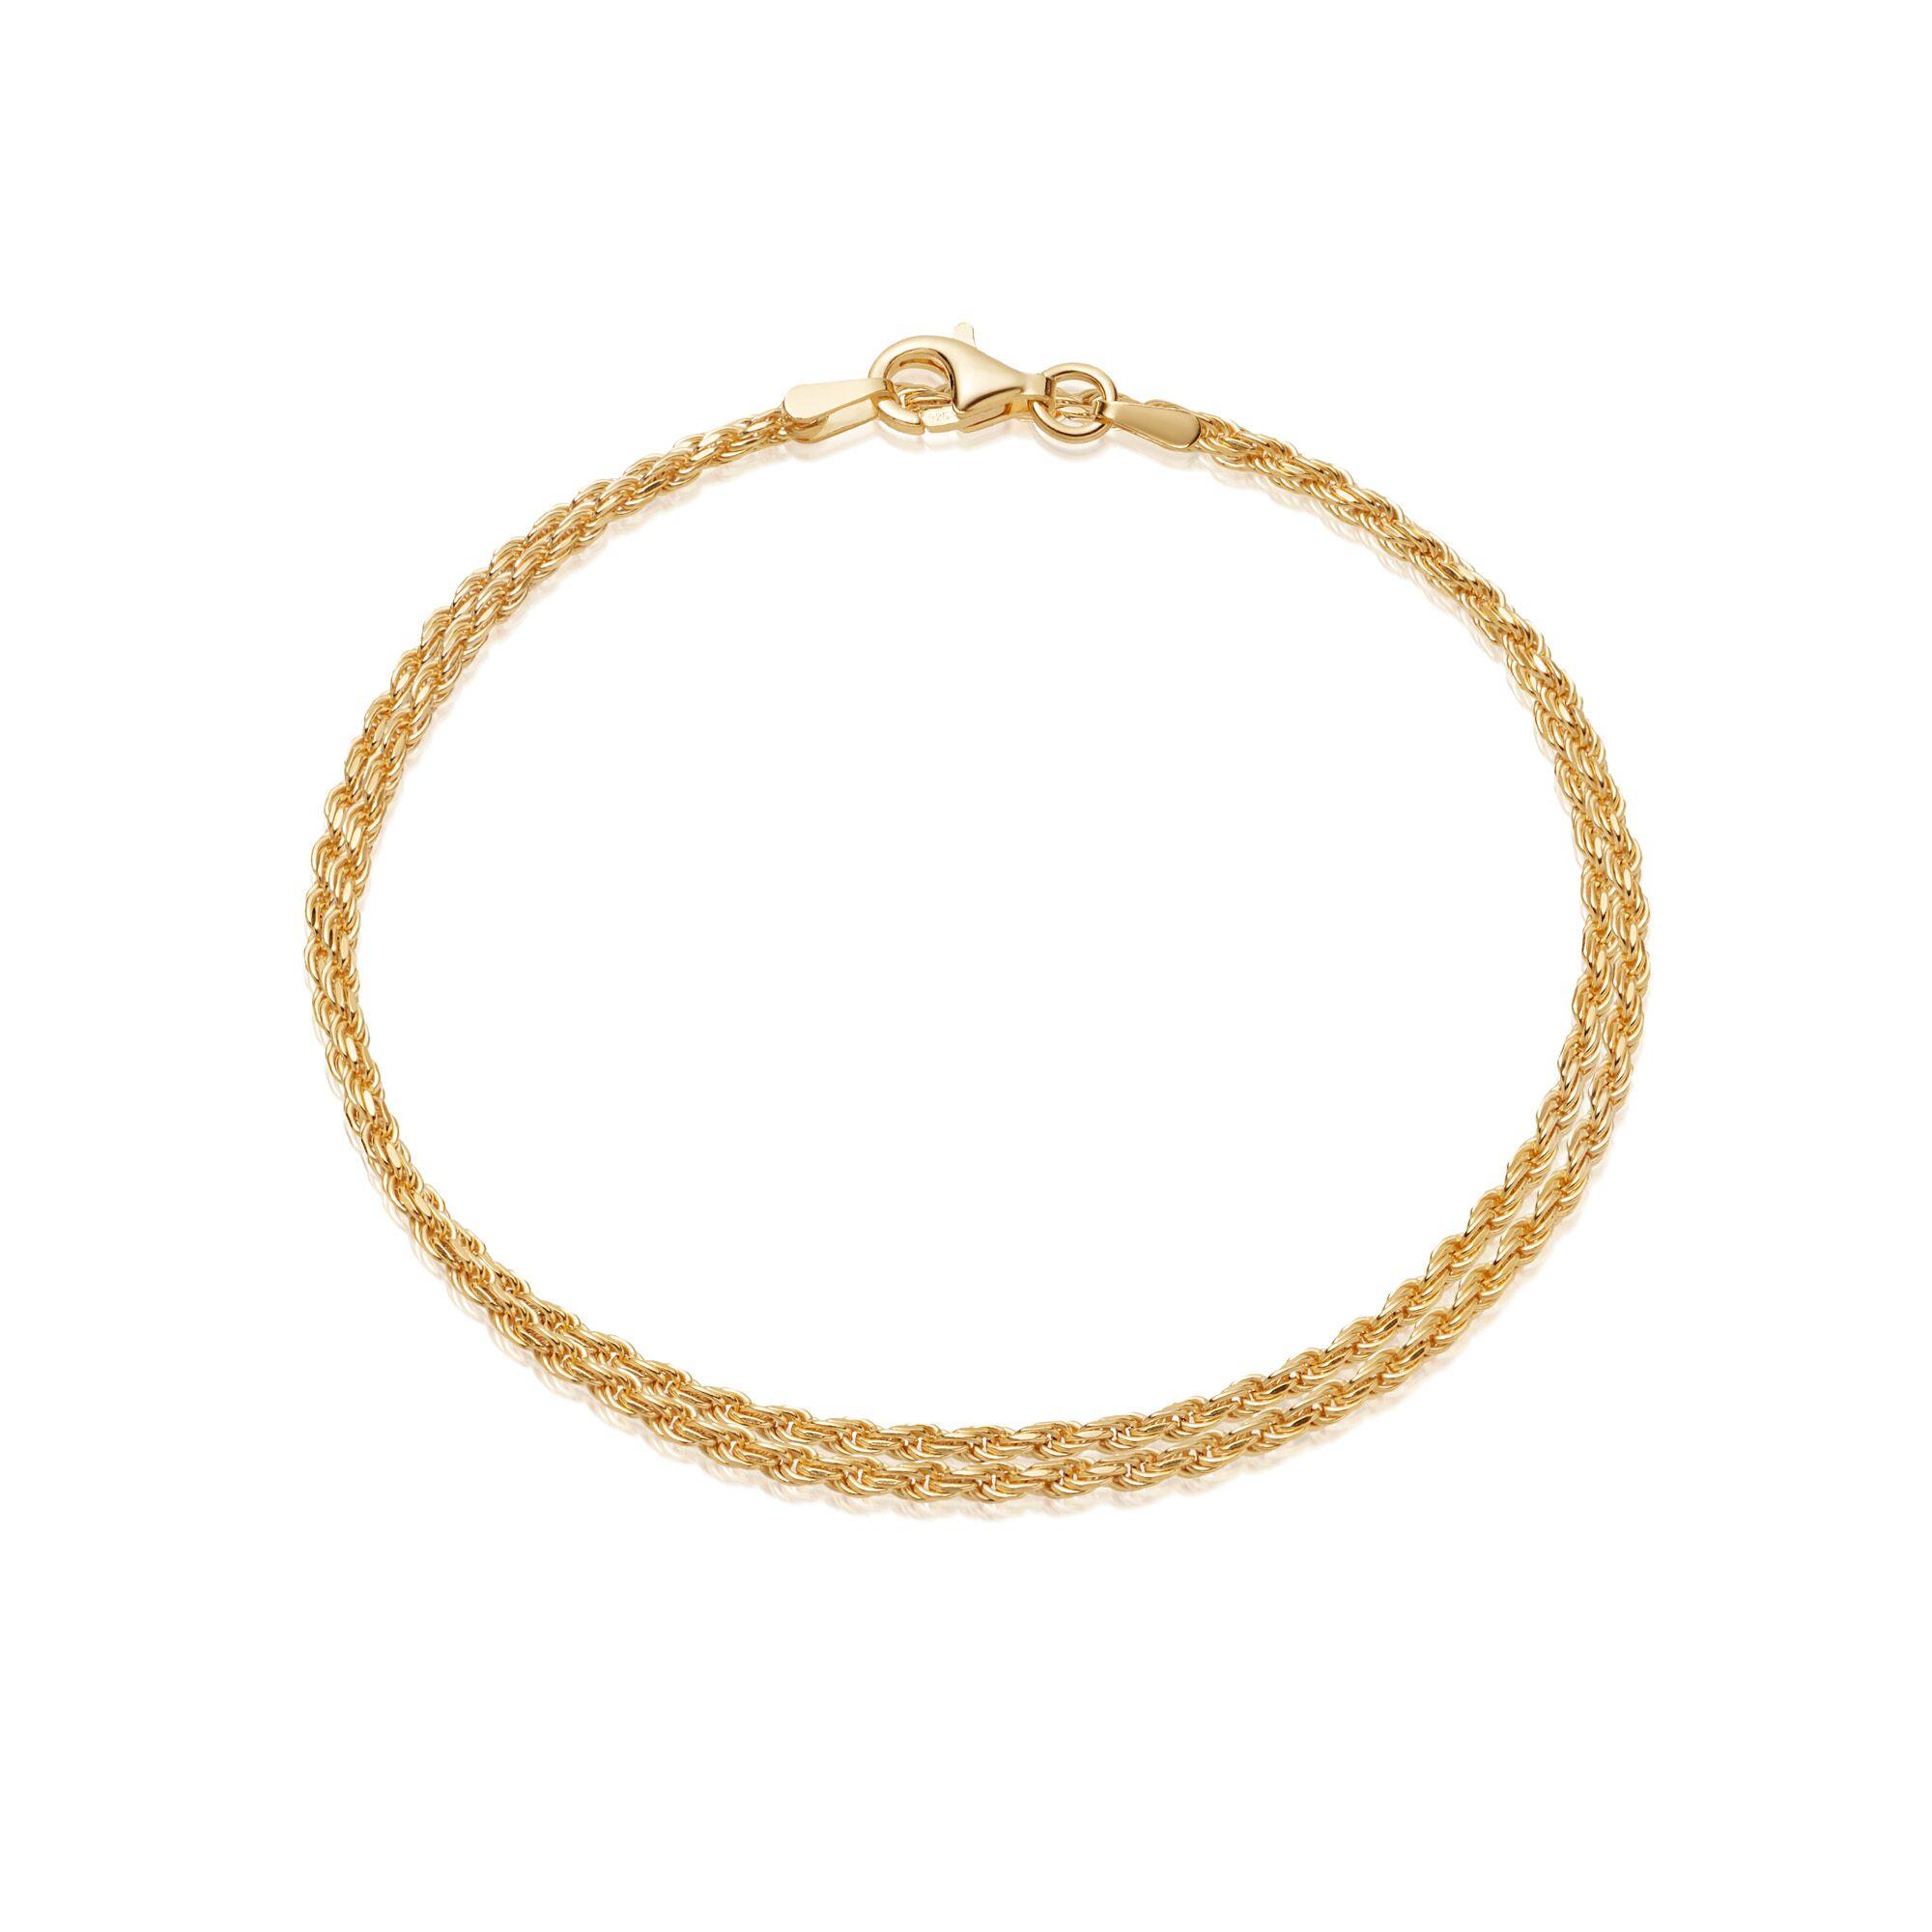 DOUBLE ROPE BRACELET GOLD